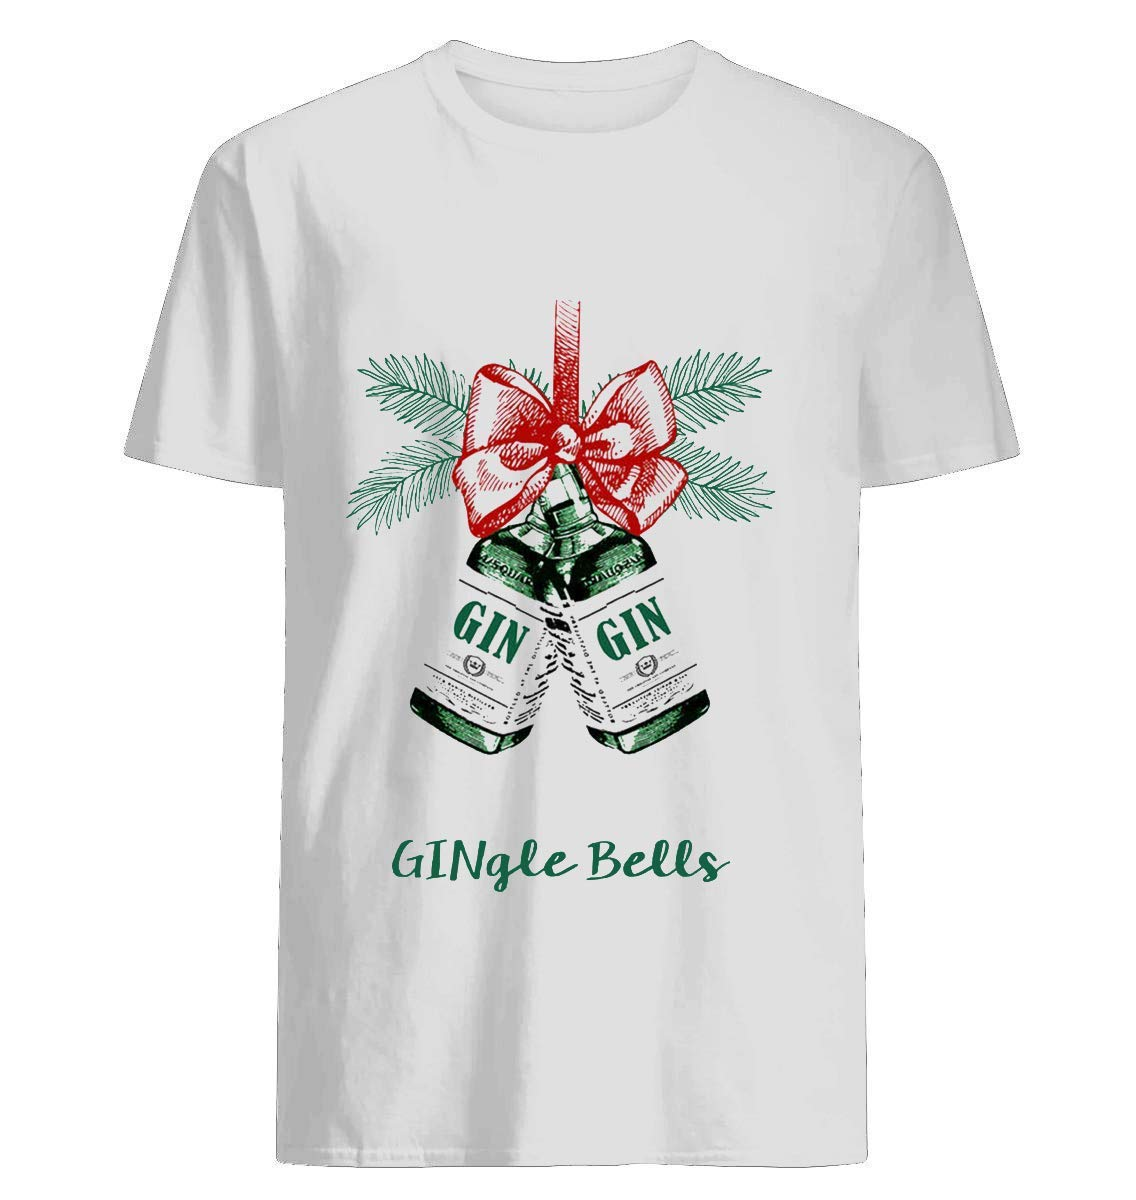 Gingle Bells Jingle Bell Gin 79 Shirts